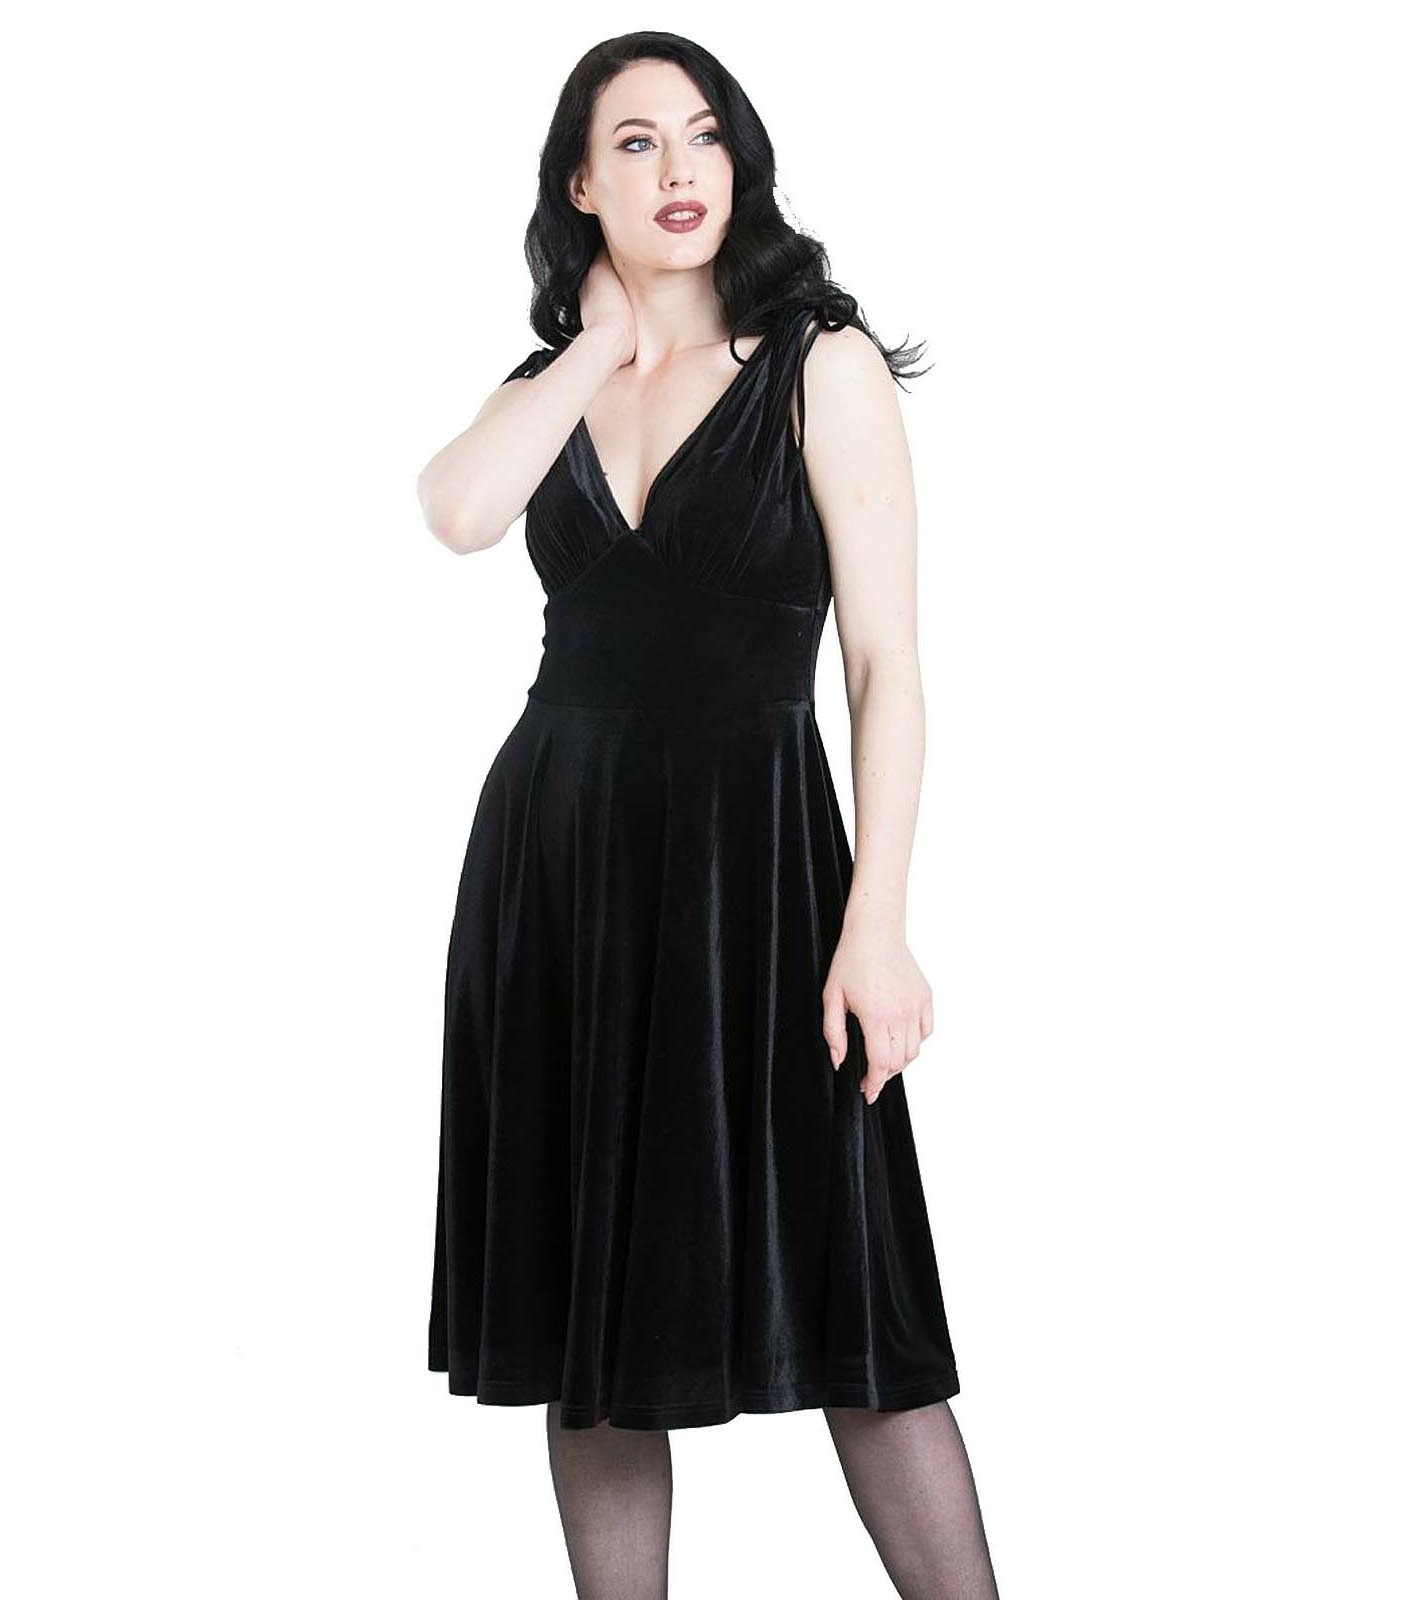 Hell-Bunny-40s-50s-Elegant-Pin-Up-Dress-MELINA-Crushed-Velvet-Black-All-Sizes thumbnail 7